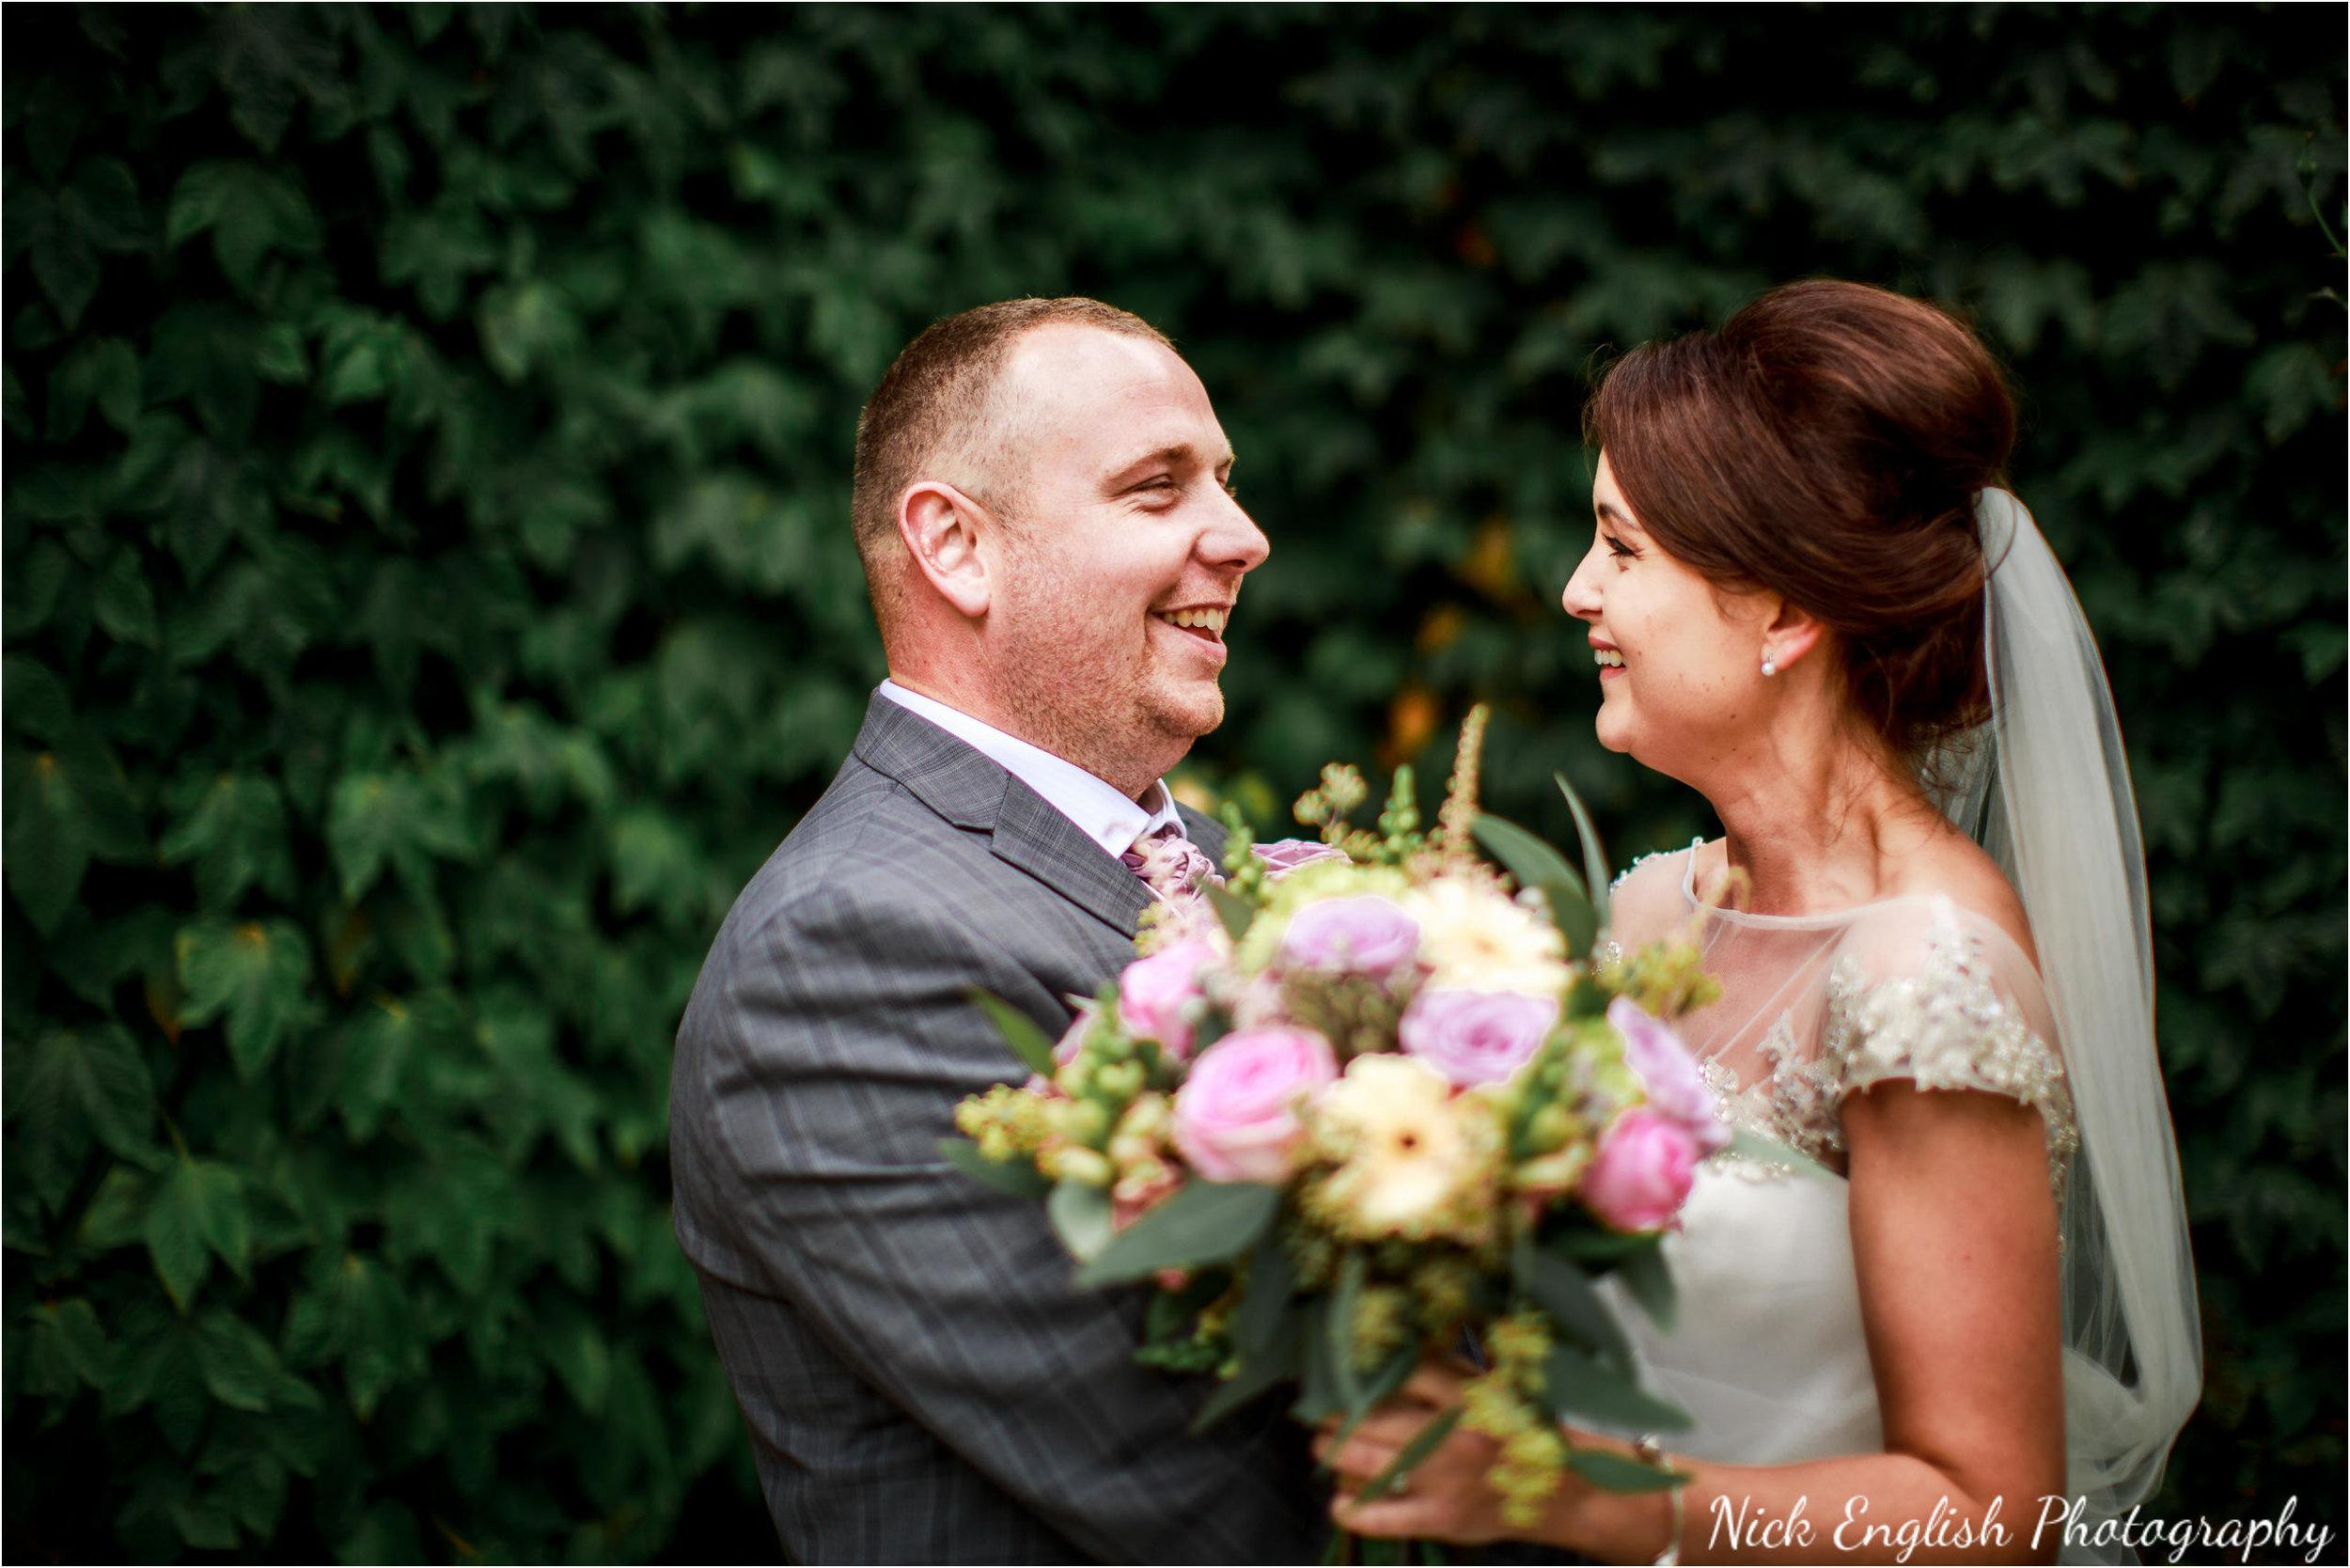 Stacey-Ash-Wedding-Photographs-Stanley-House-Preston-Lancashire-128.jpg